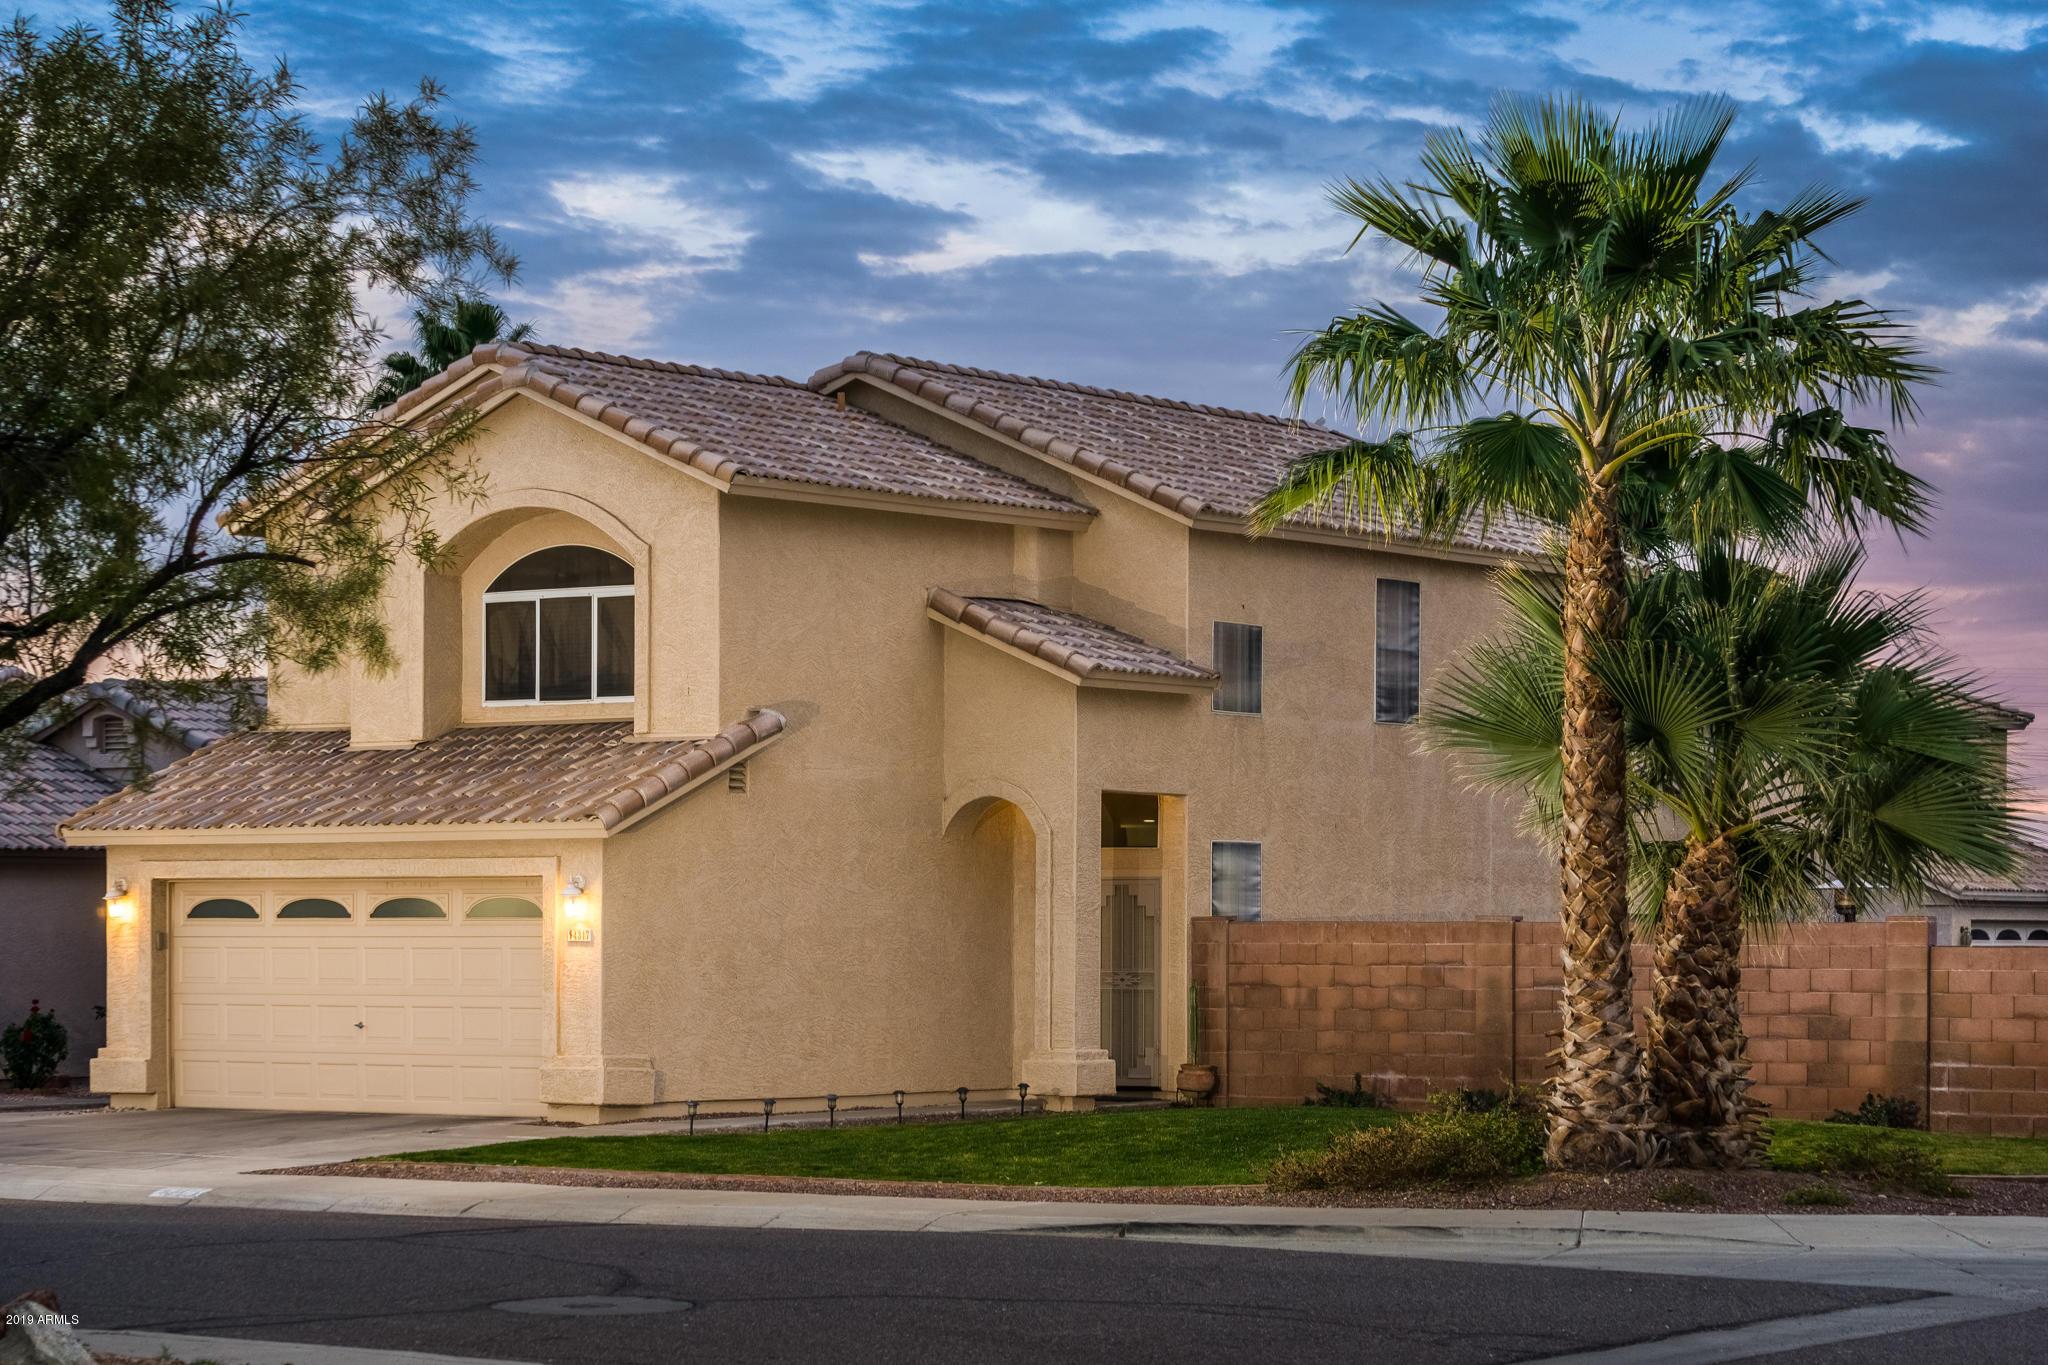 Photo for 4317 E Windsong Drive, Phoenix, AZ 85048 (MLS # 5879863)